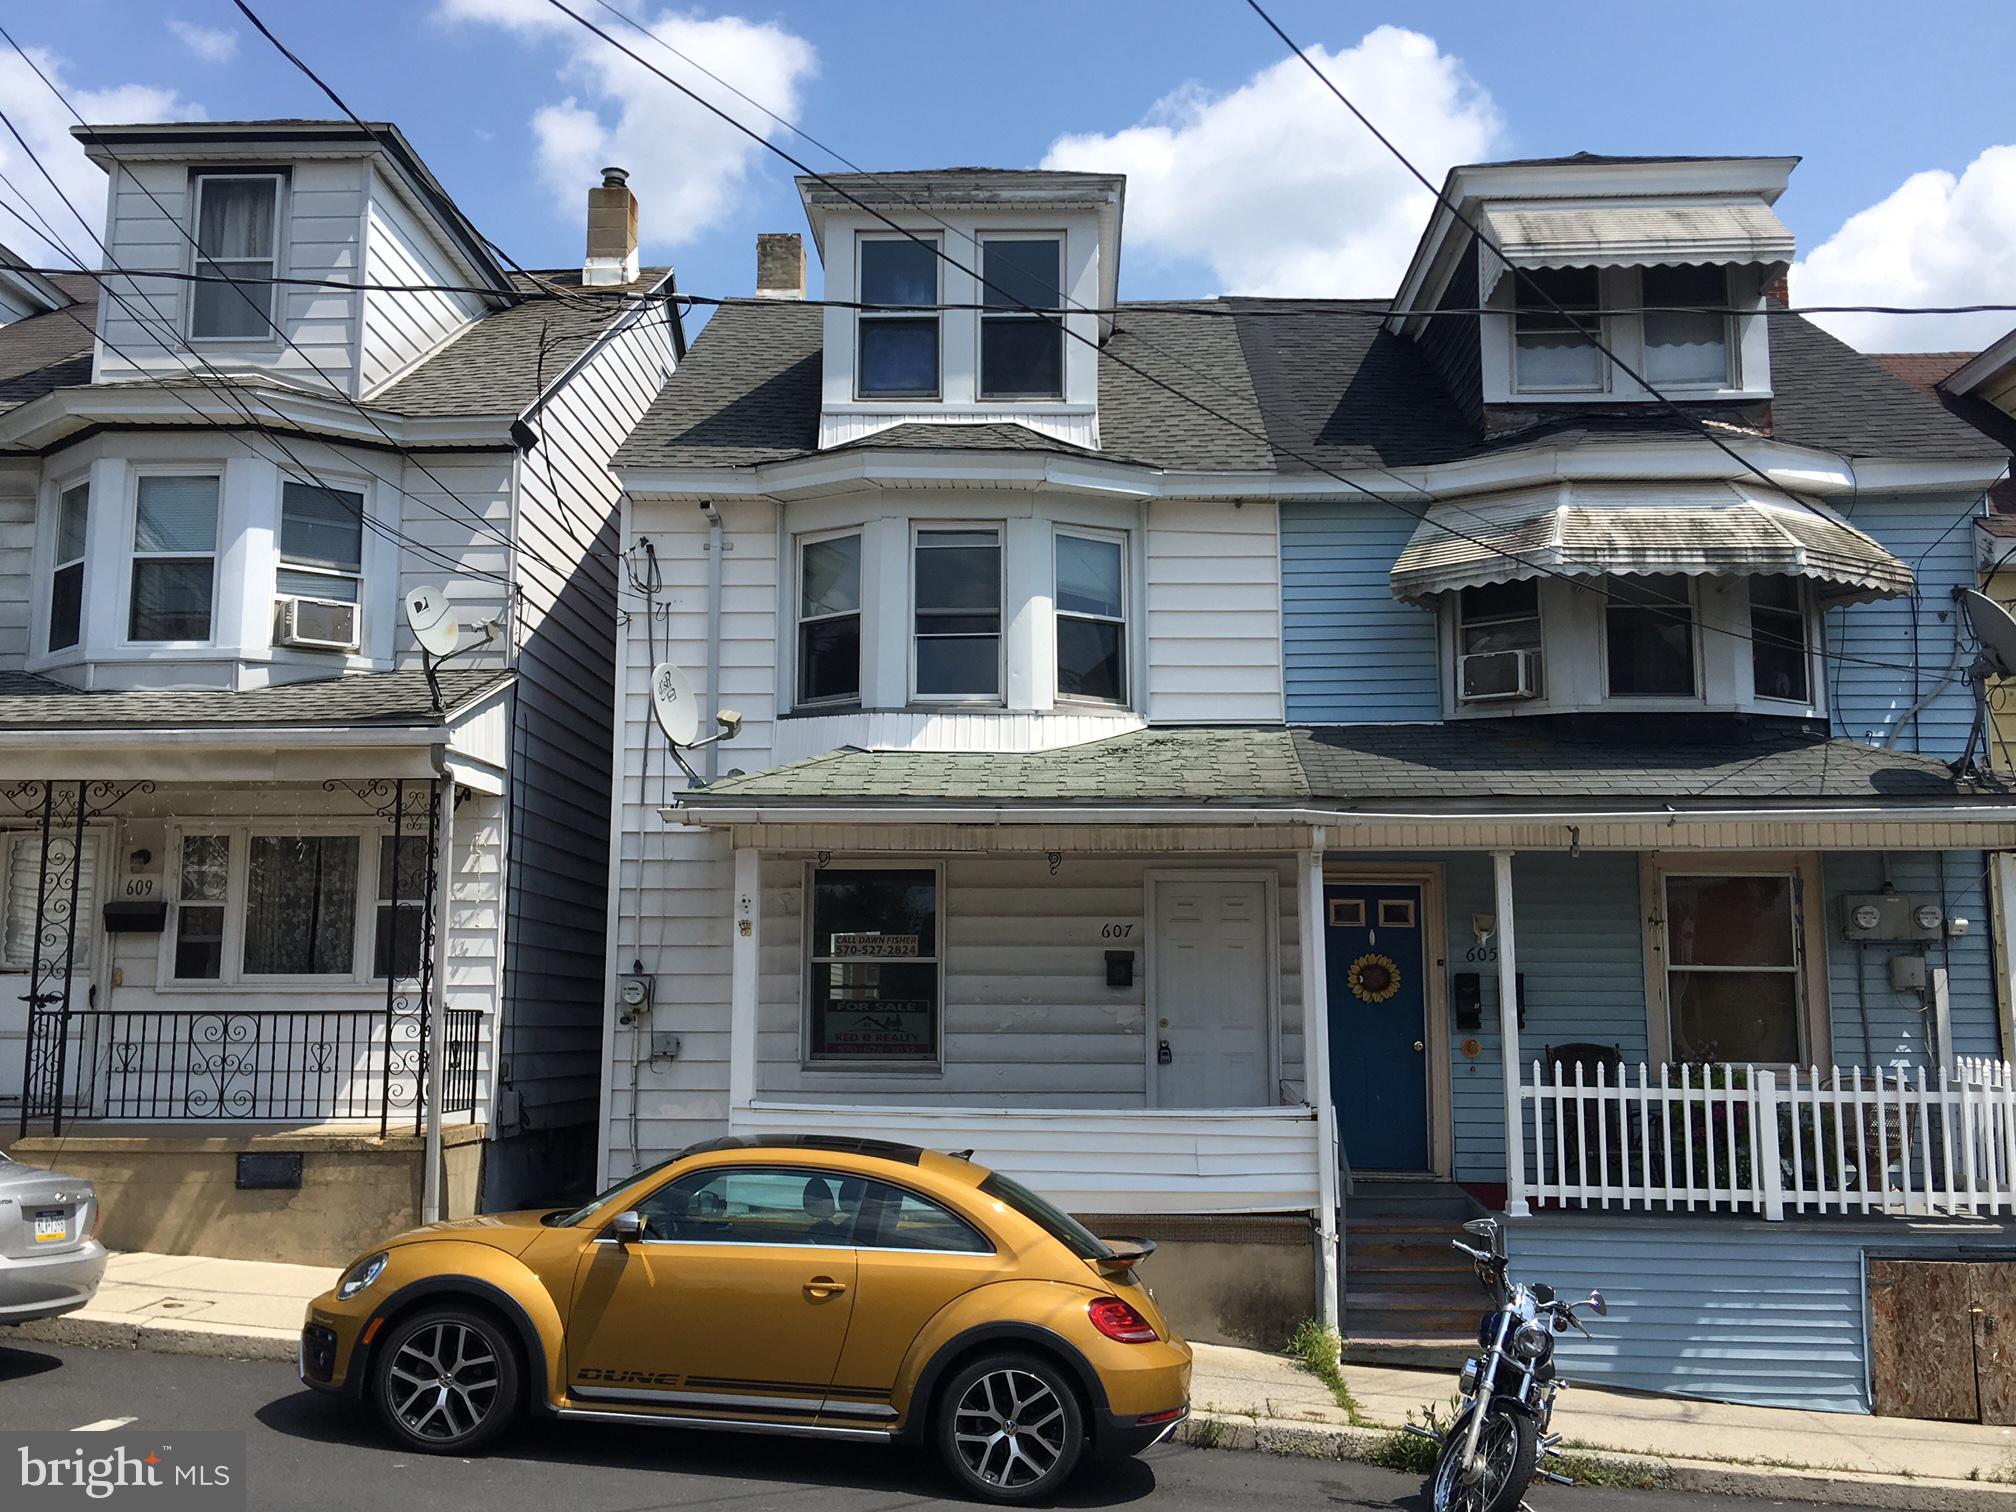 607 N 2ND STREET, MINERSVILLE, PA 17954